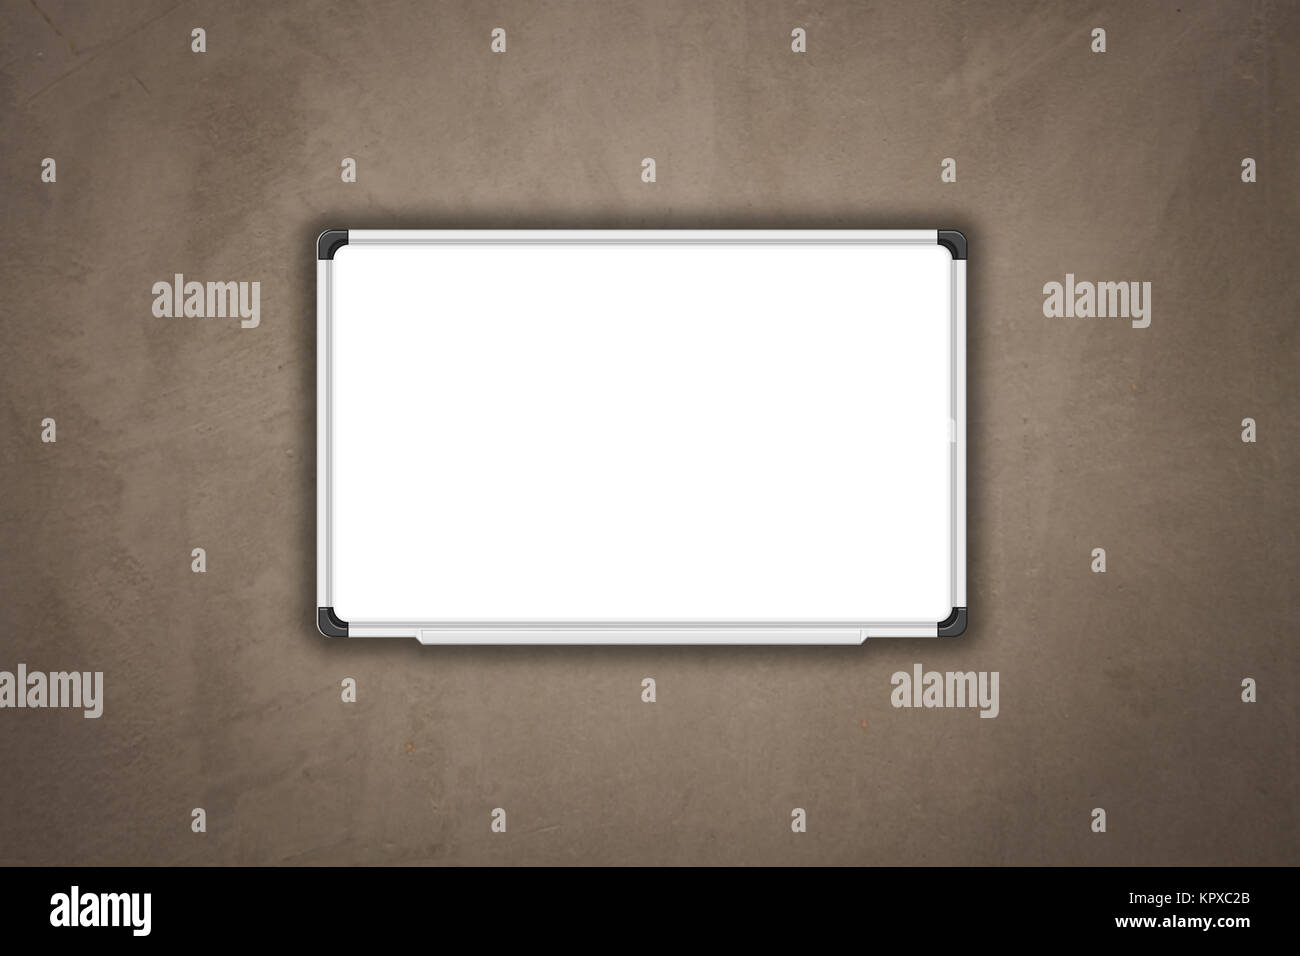 Blank white baord on concrete texture background - Stock Image